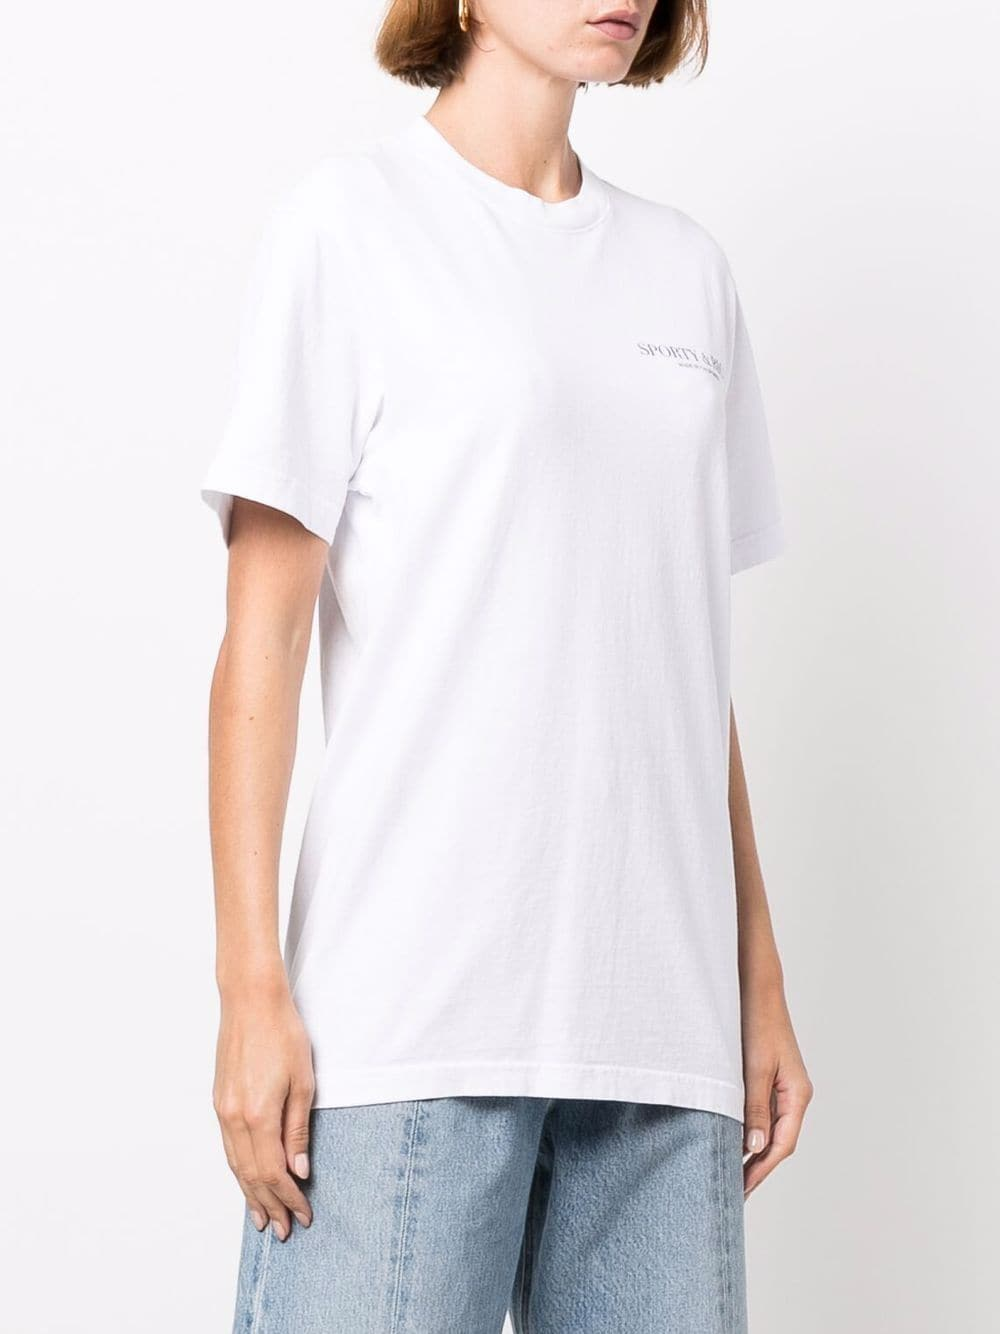 t-shirt california unisex bianca in cotone SPORTY & RICH   T-shirt   TS262WH